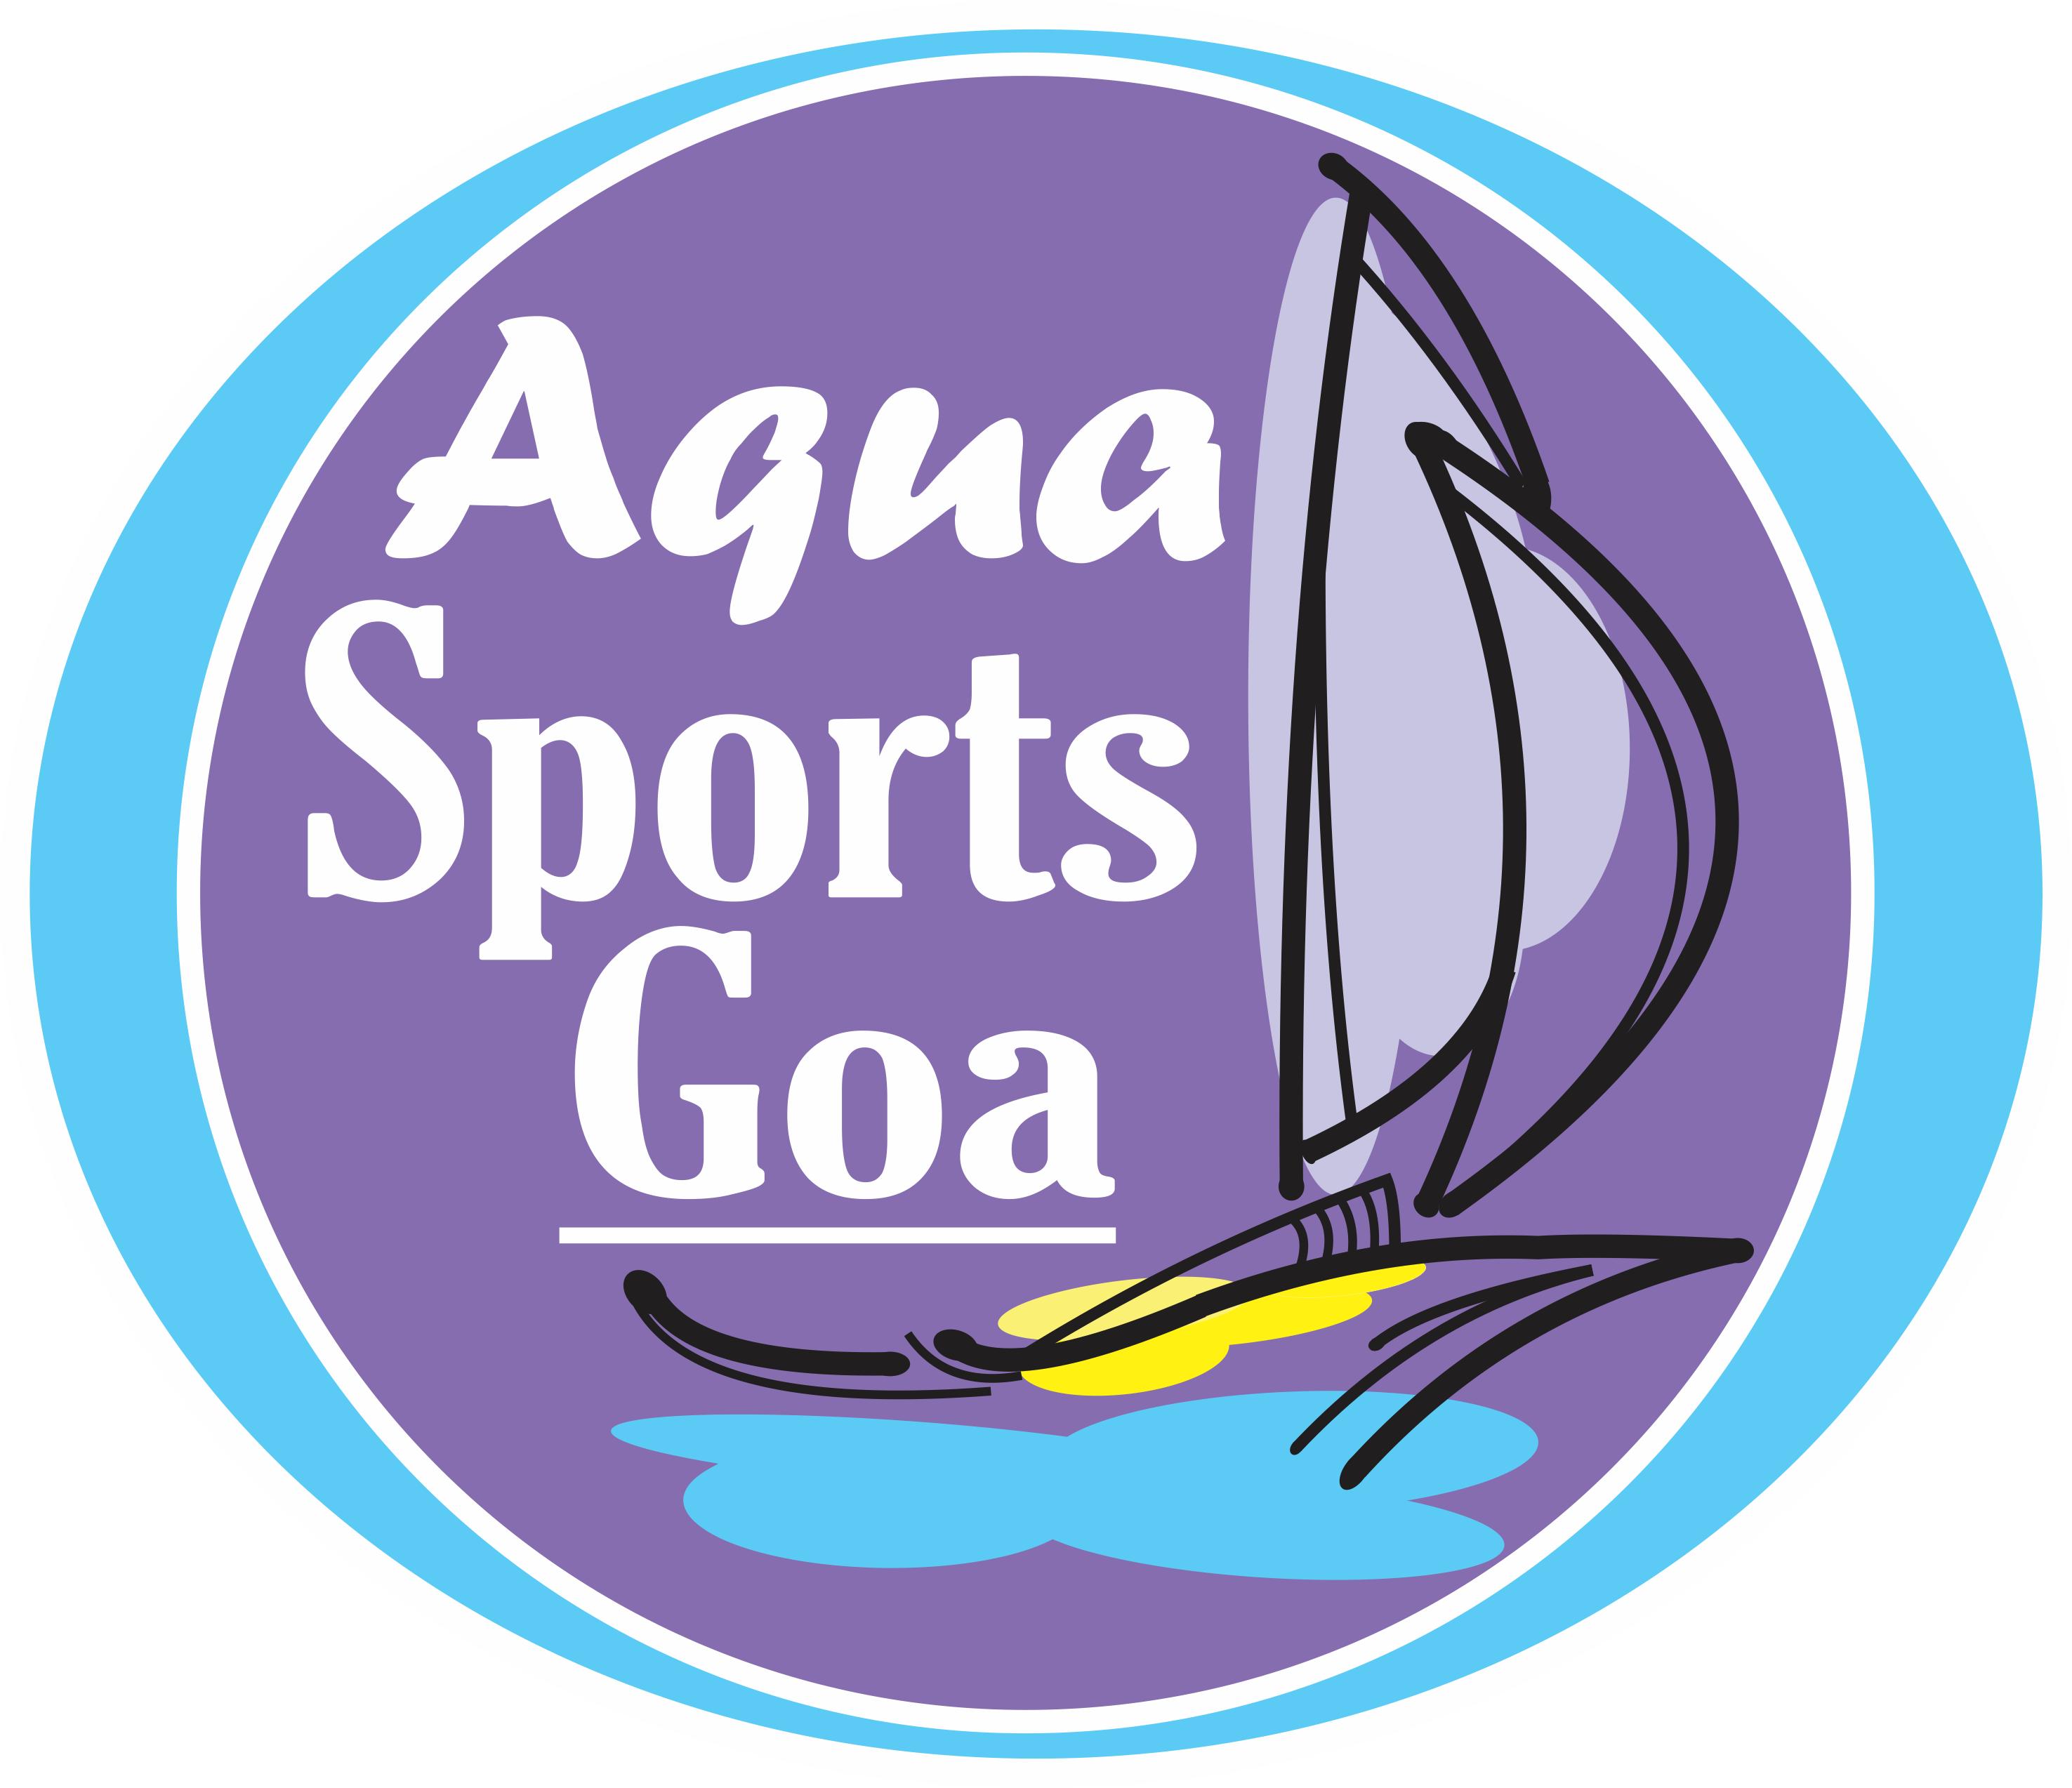 Sports goa about trepup. Water clipart aqua